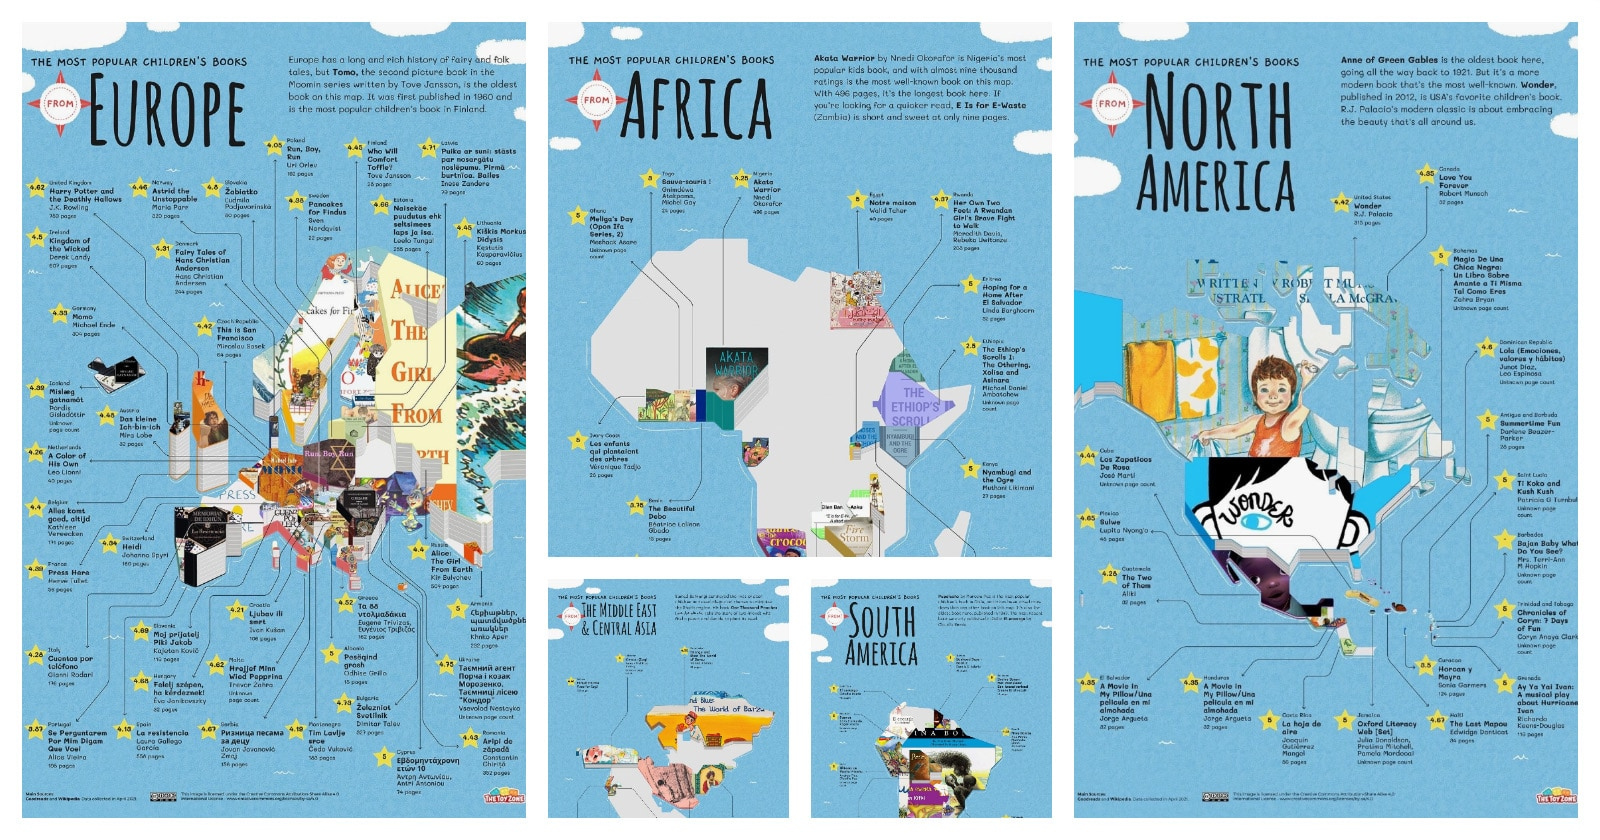 Most popular children's books from around the world